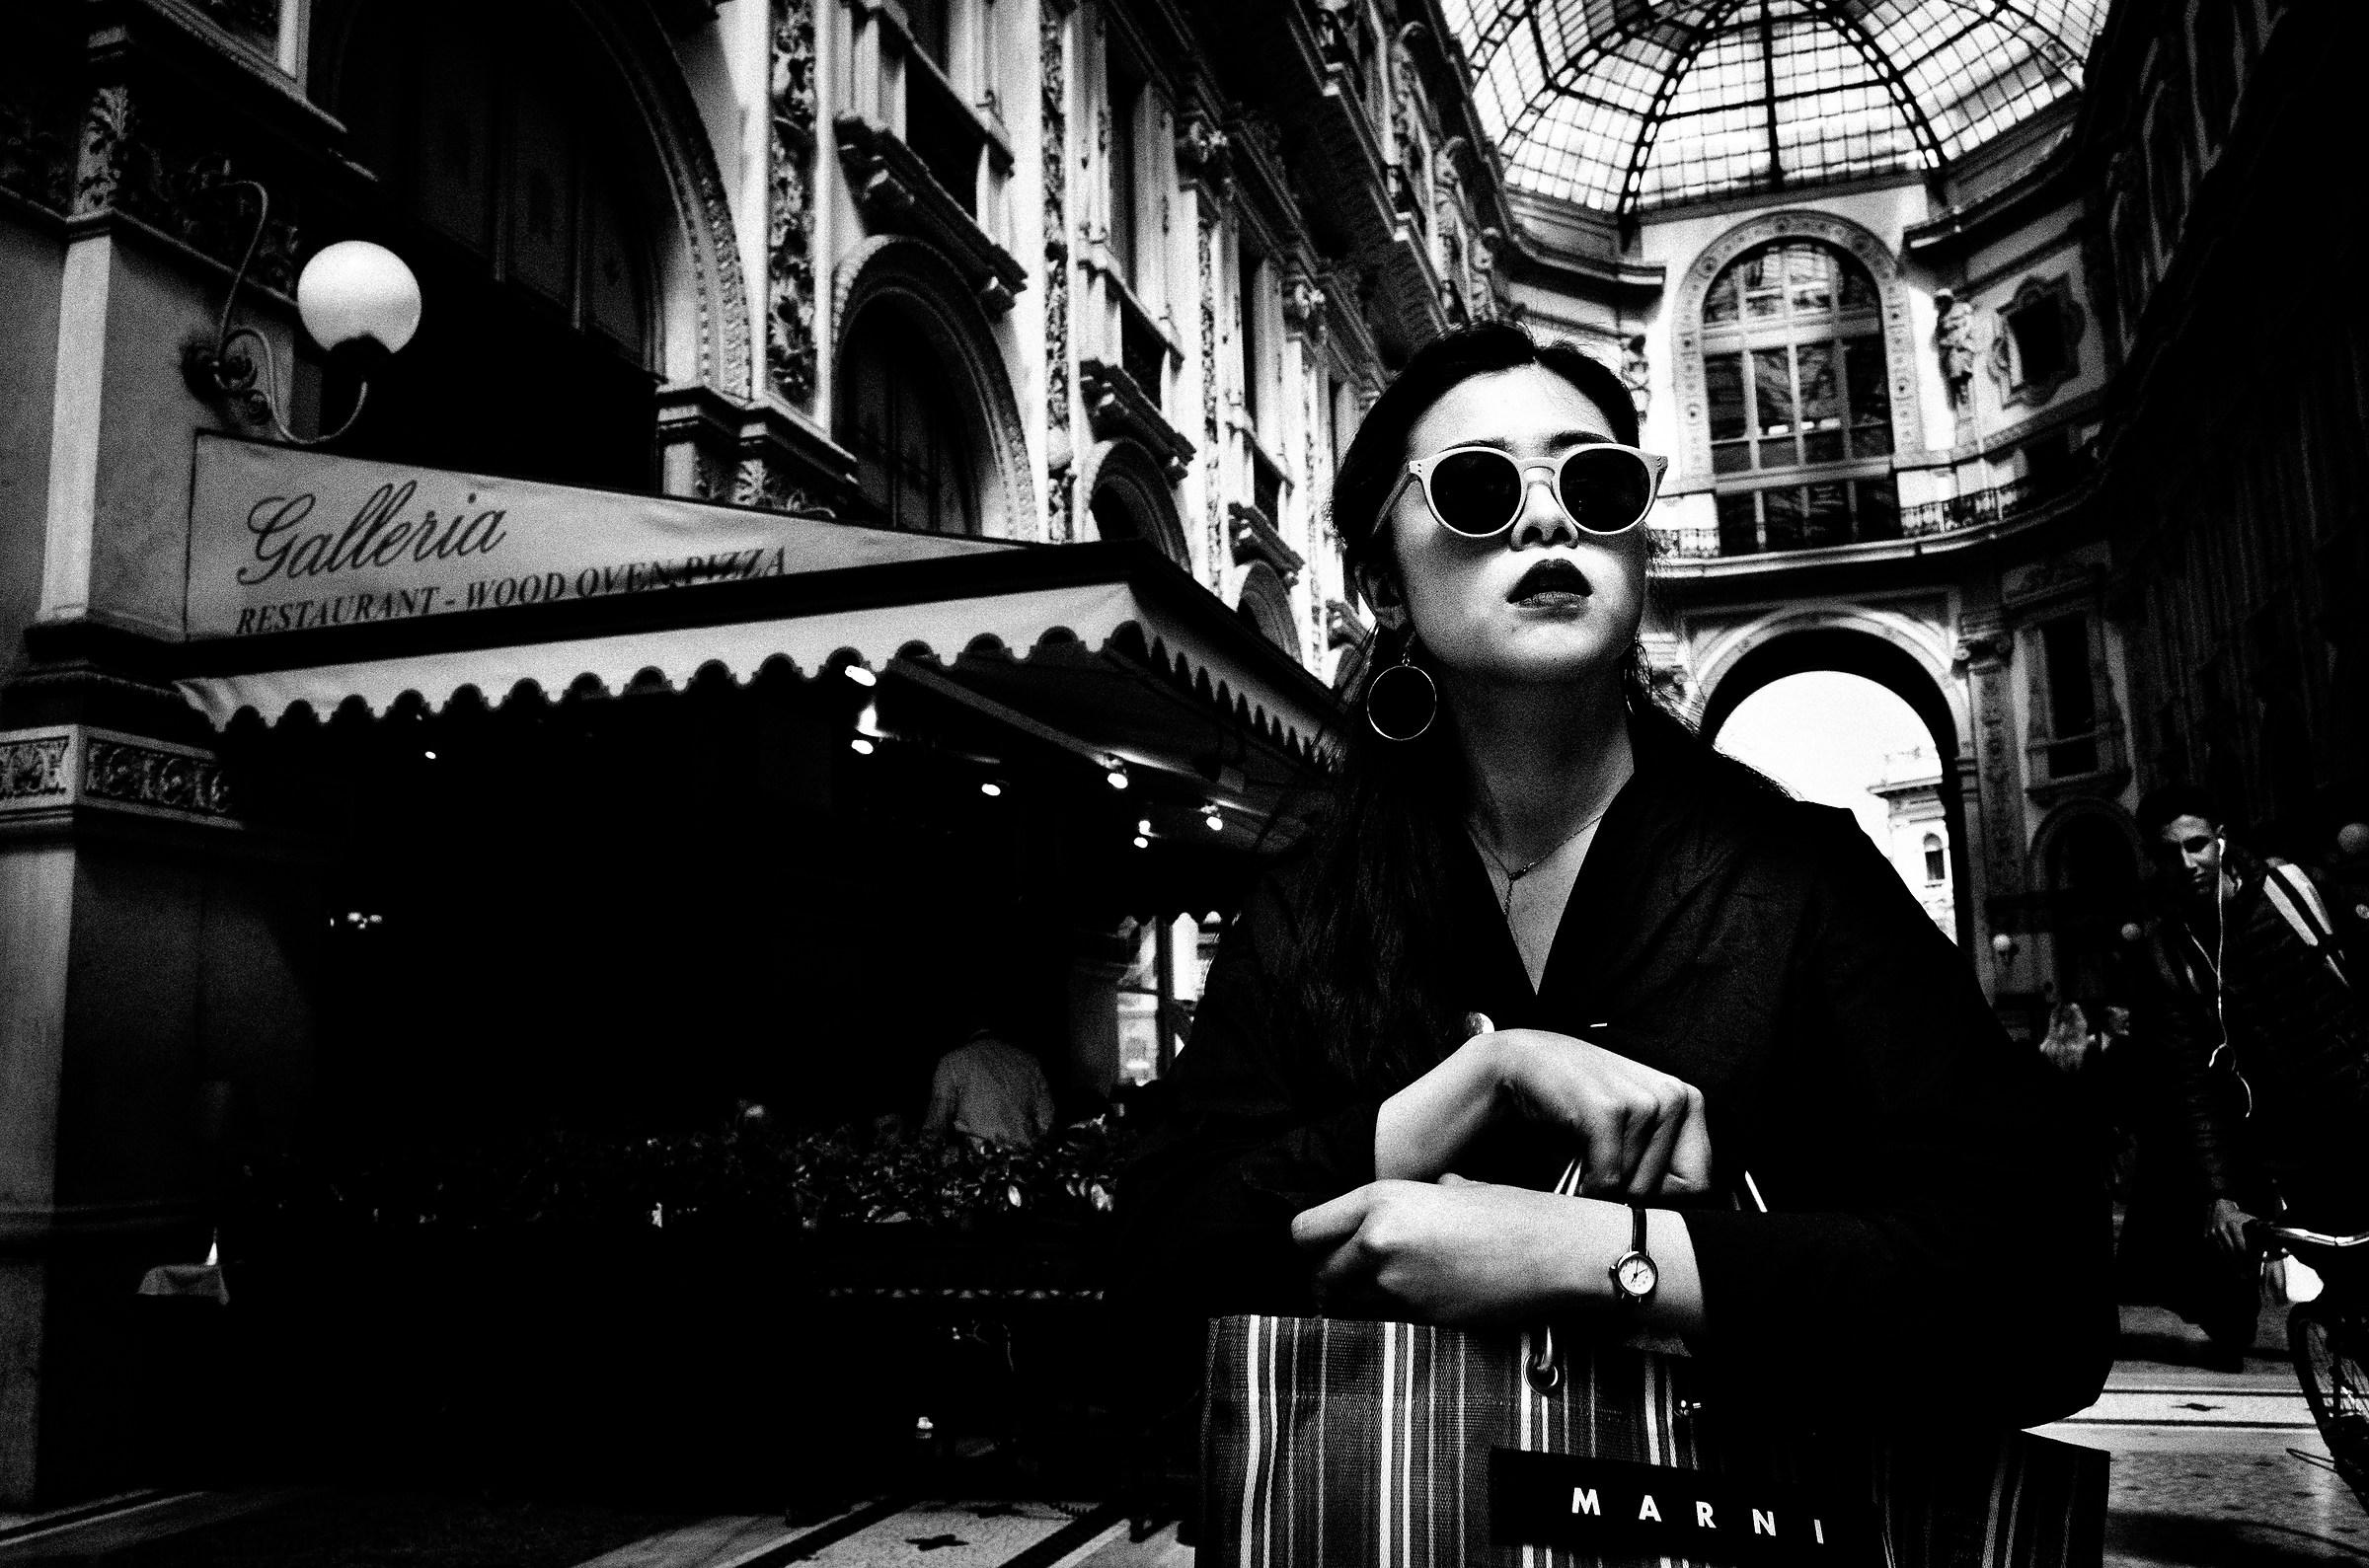 Milano_People 2018.04.17...